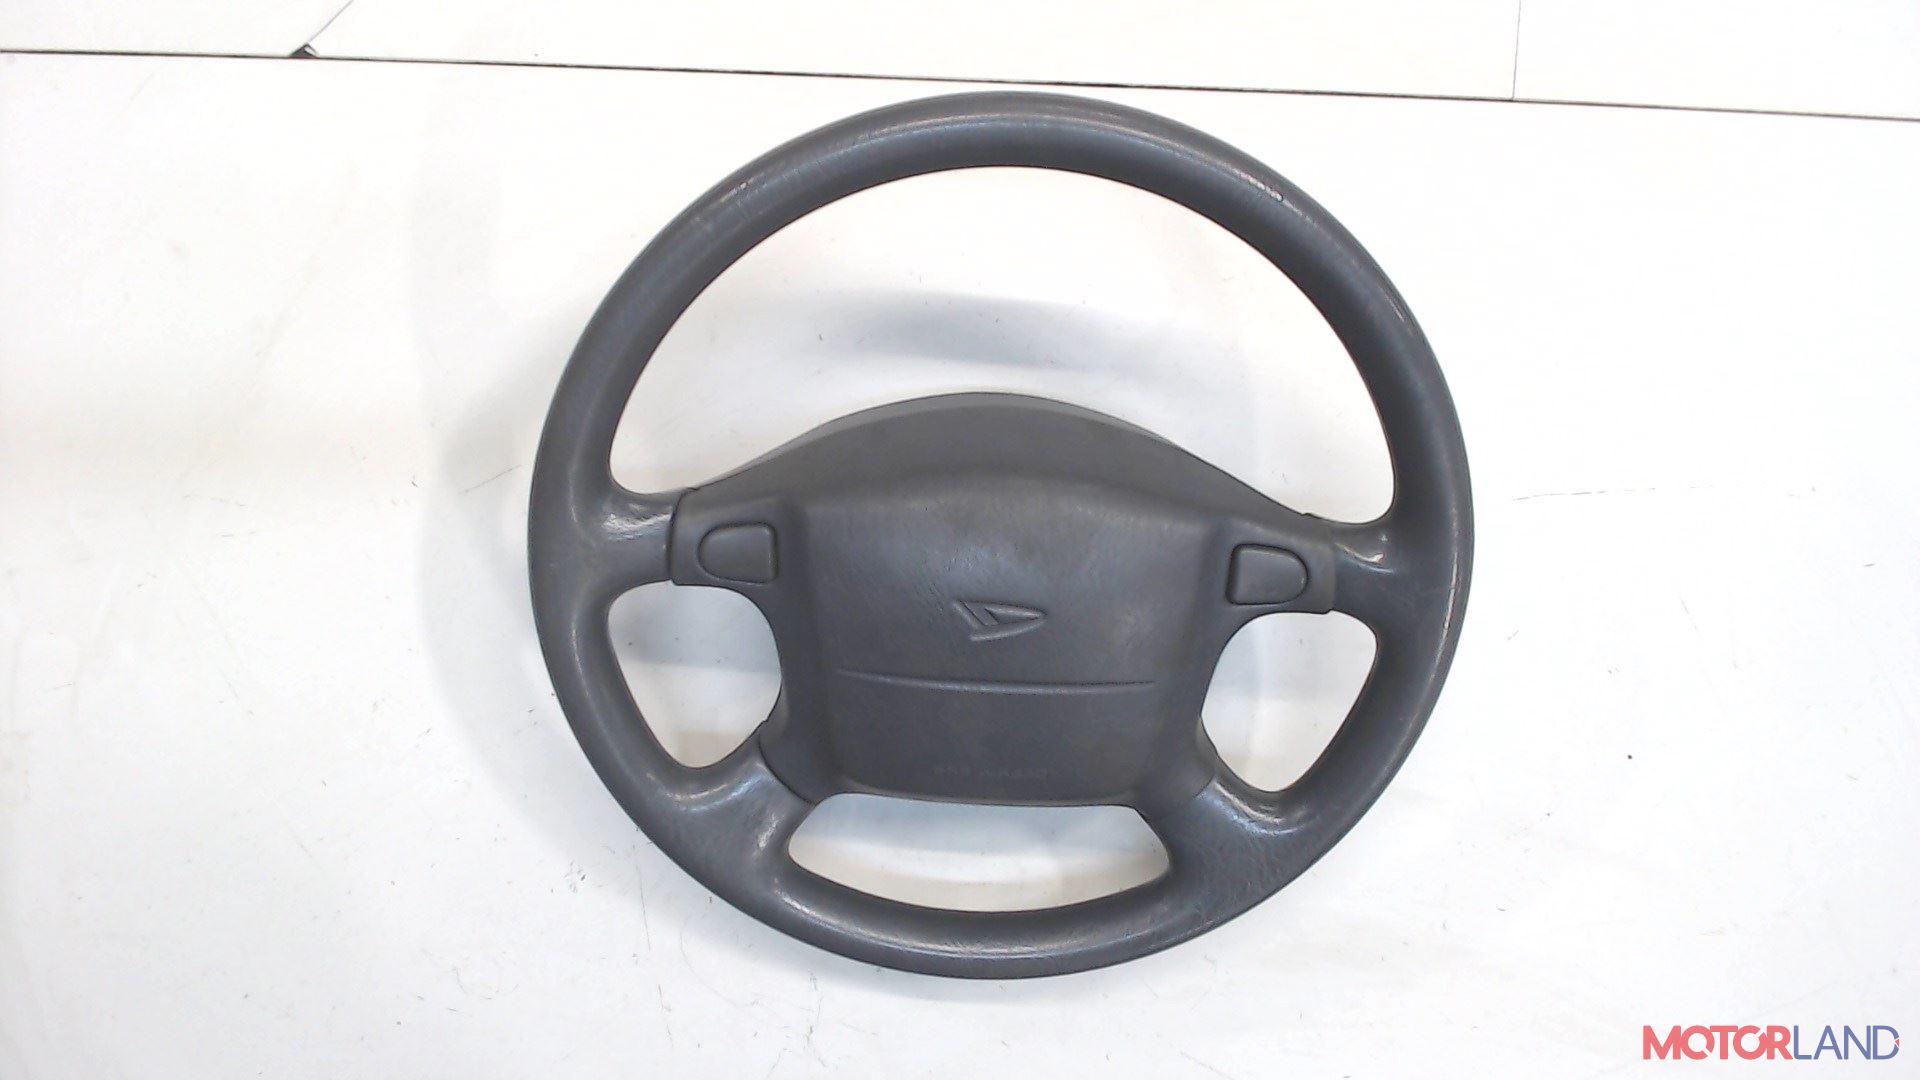 Руль Daihatsu Cuore 1995-1999, Артикул 5646926 #1